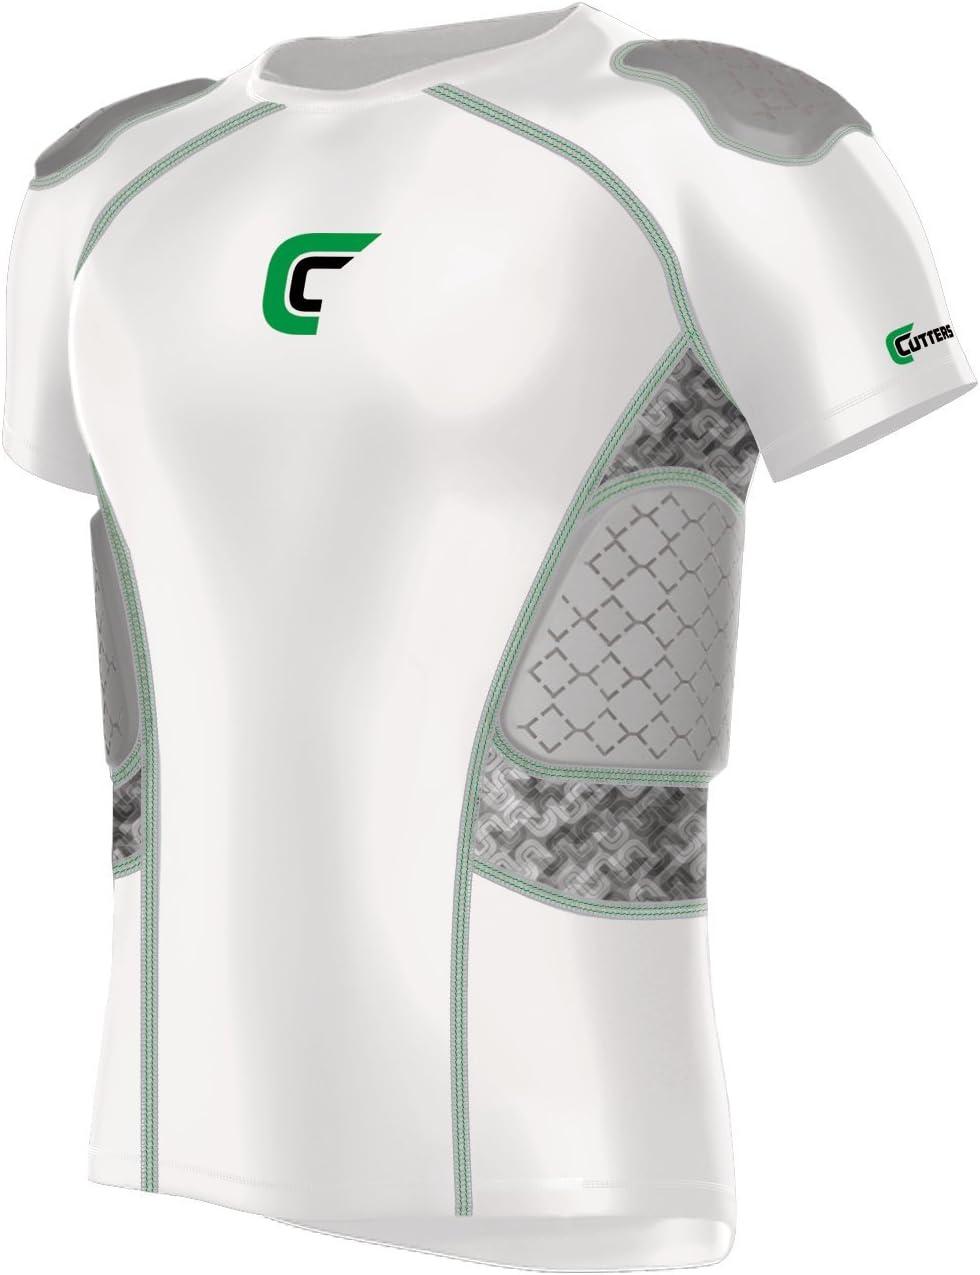 Cutters Rev Impact 5-padシャツフットボール、大人用 ホワイト/迷彩 Large